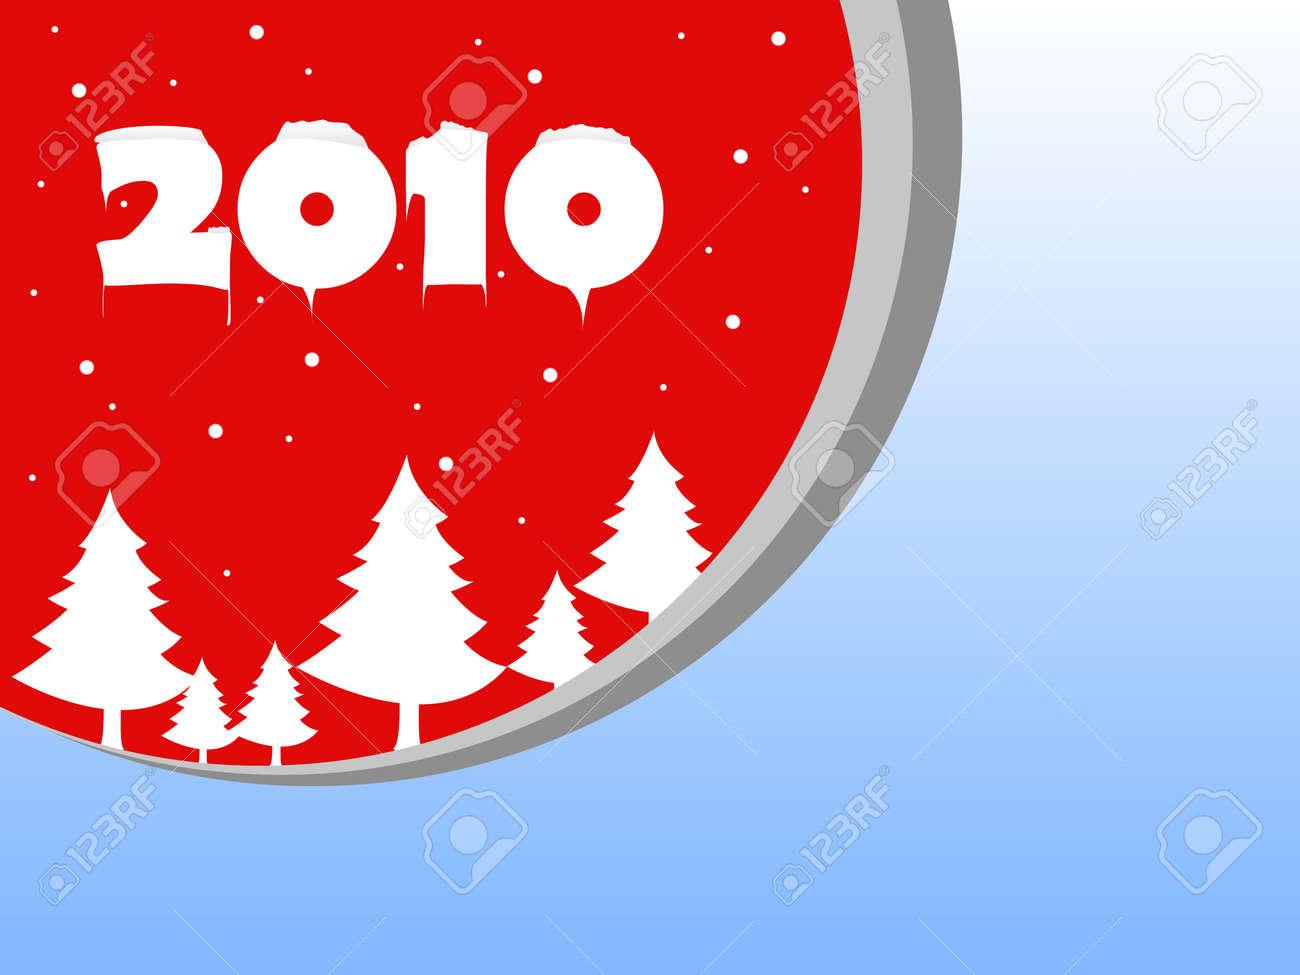 Christmas fur-tree 2010 red Stock Vector - 6001269